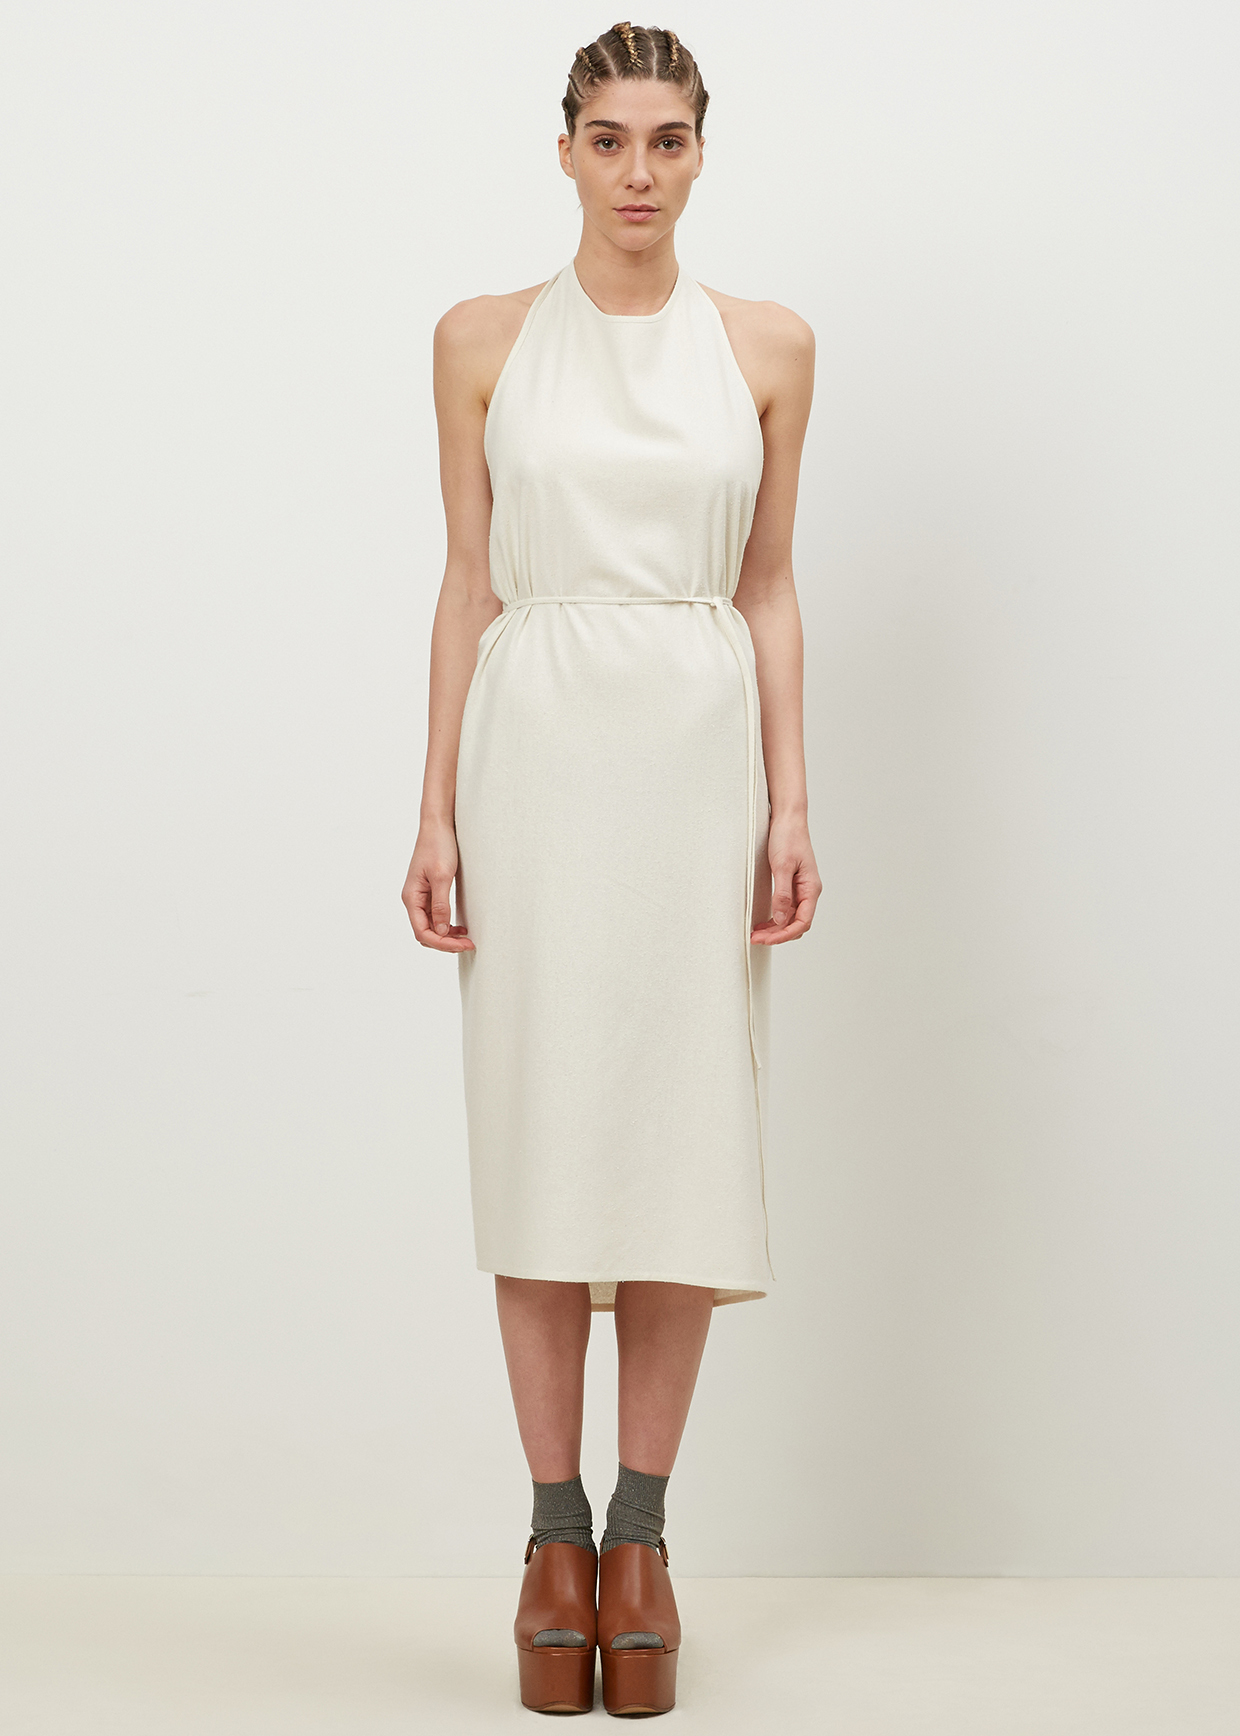 327fd1c3c48 Baserange Off White Apron Dress in White - Lyst